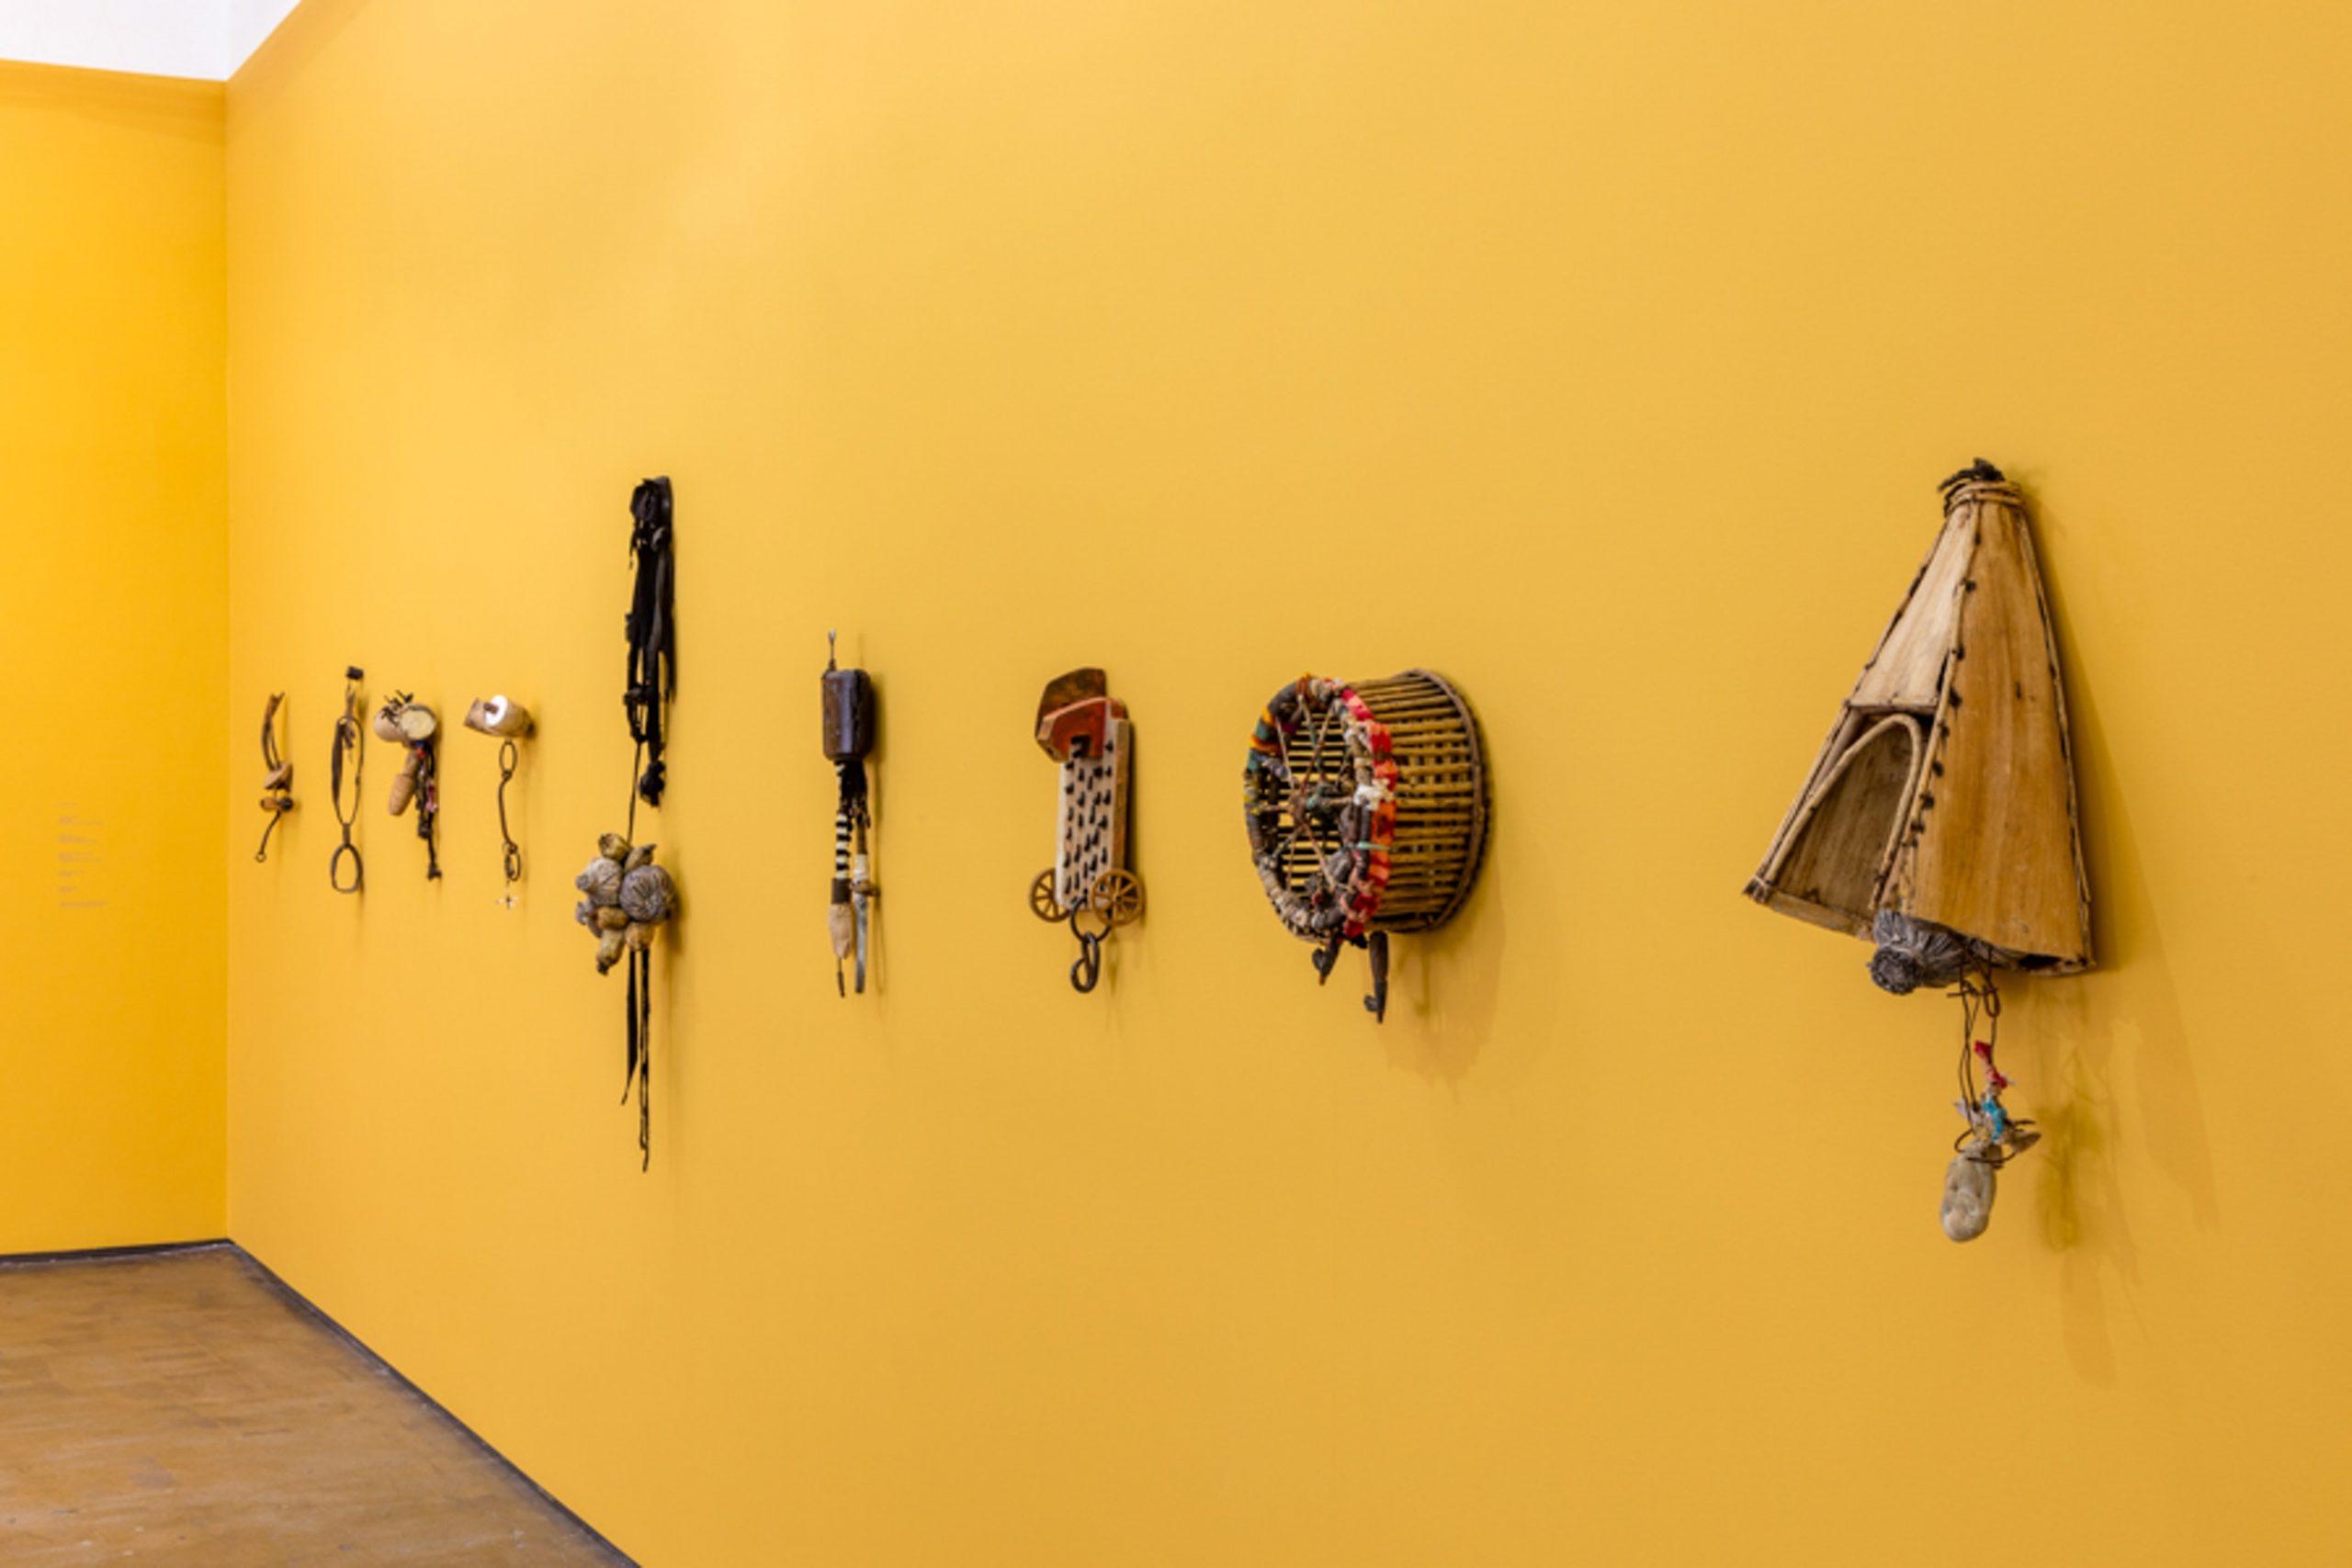 John Outterbridge: Rag Man, installation view, Art + Practice, Los Angeles. December 12, 2015 - February 27, 2016. Photo by Joshua White.